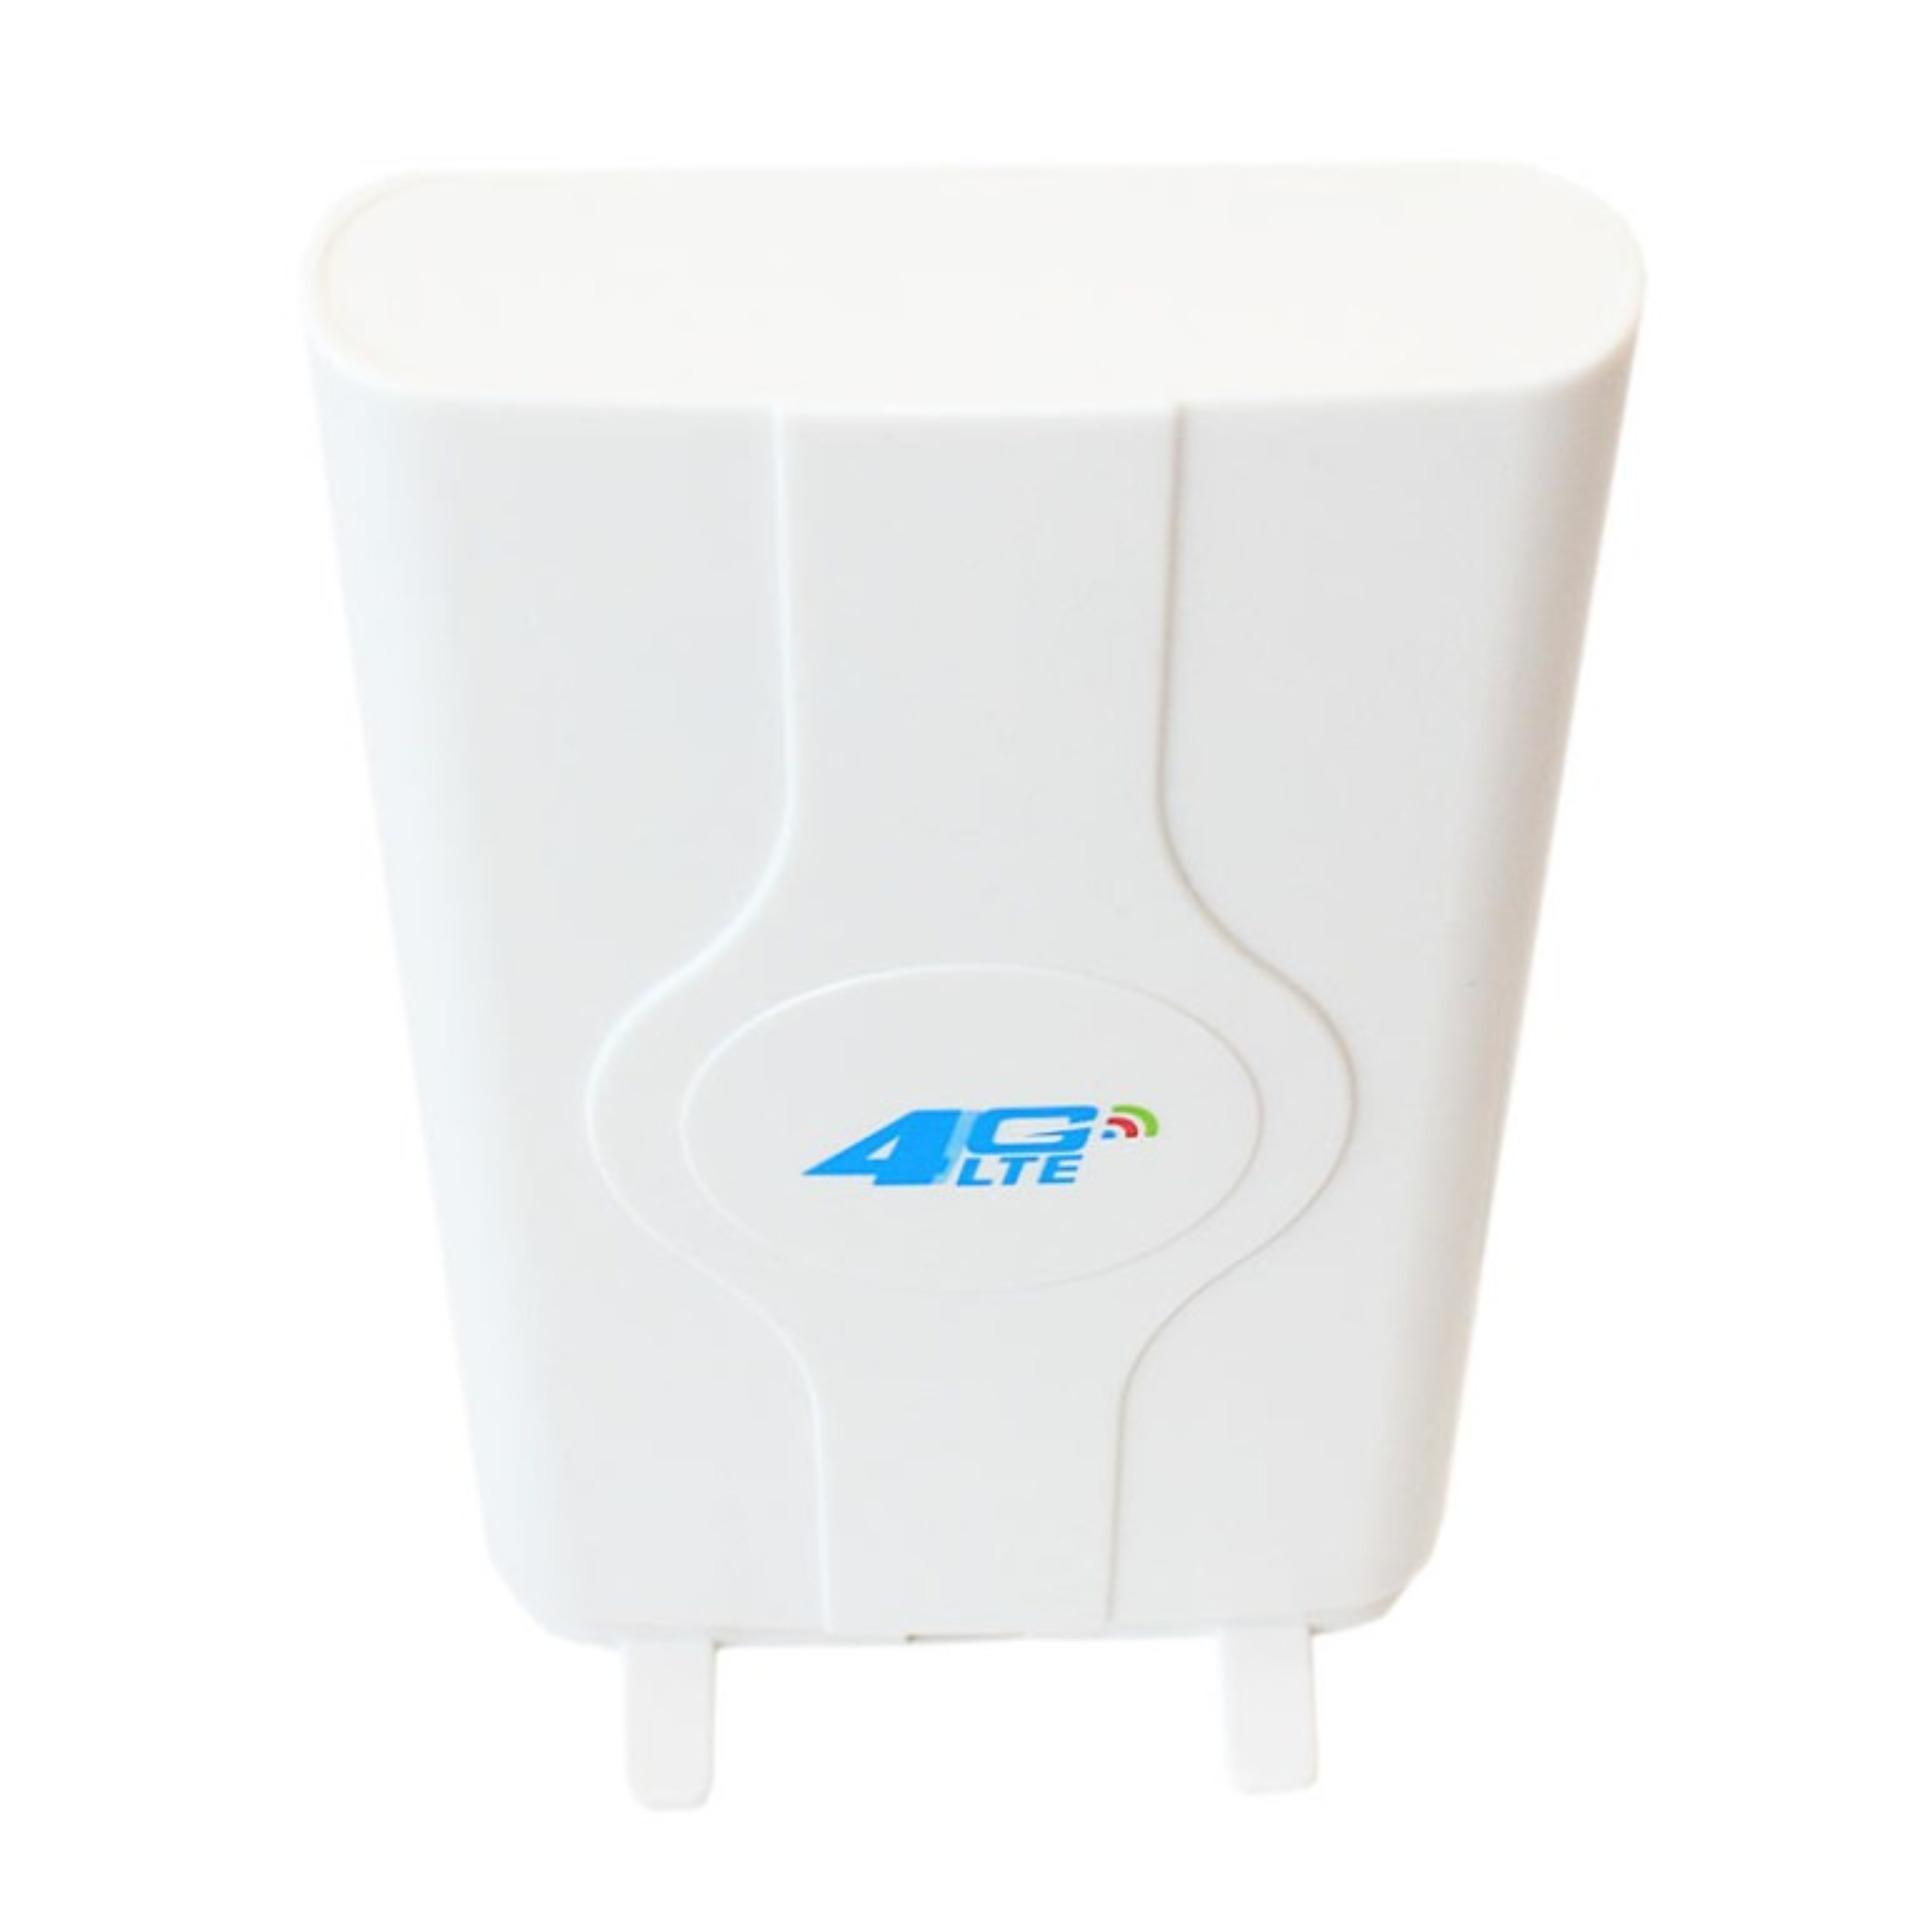 Harga Penawaran Omni Minimax G45 Antena Eksternal 4g Lte 45dbi Portable Mimo X8r Bolt Router Helios Bl100 B310 E5172 B683 B593 Dengan Konektor Ts9 Putih